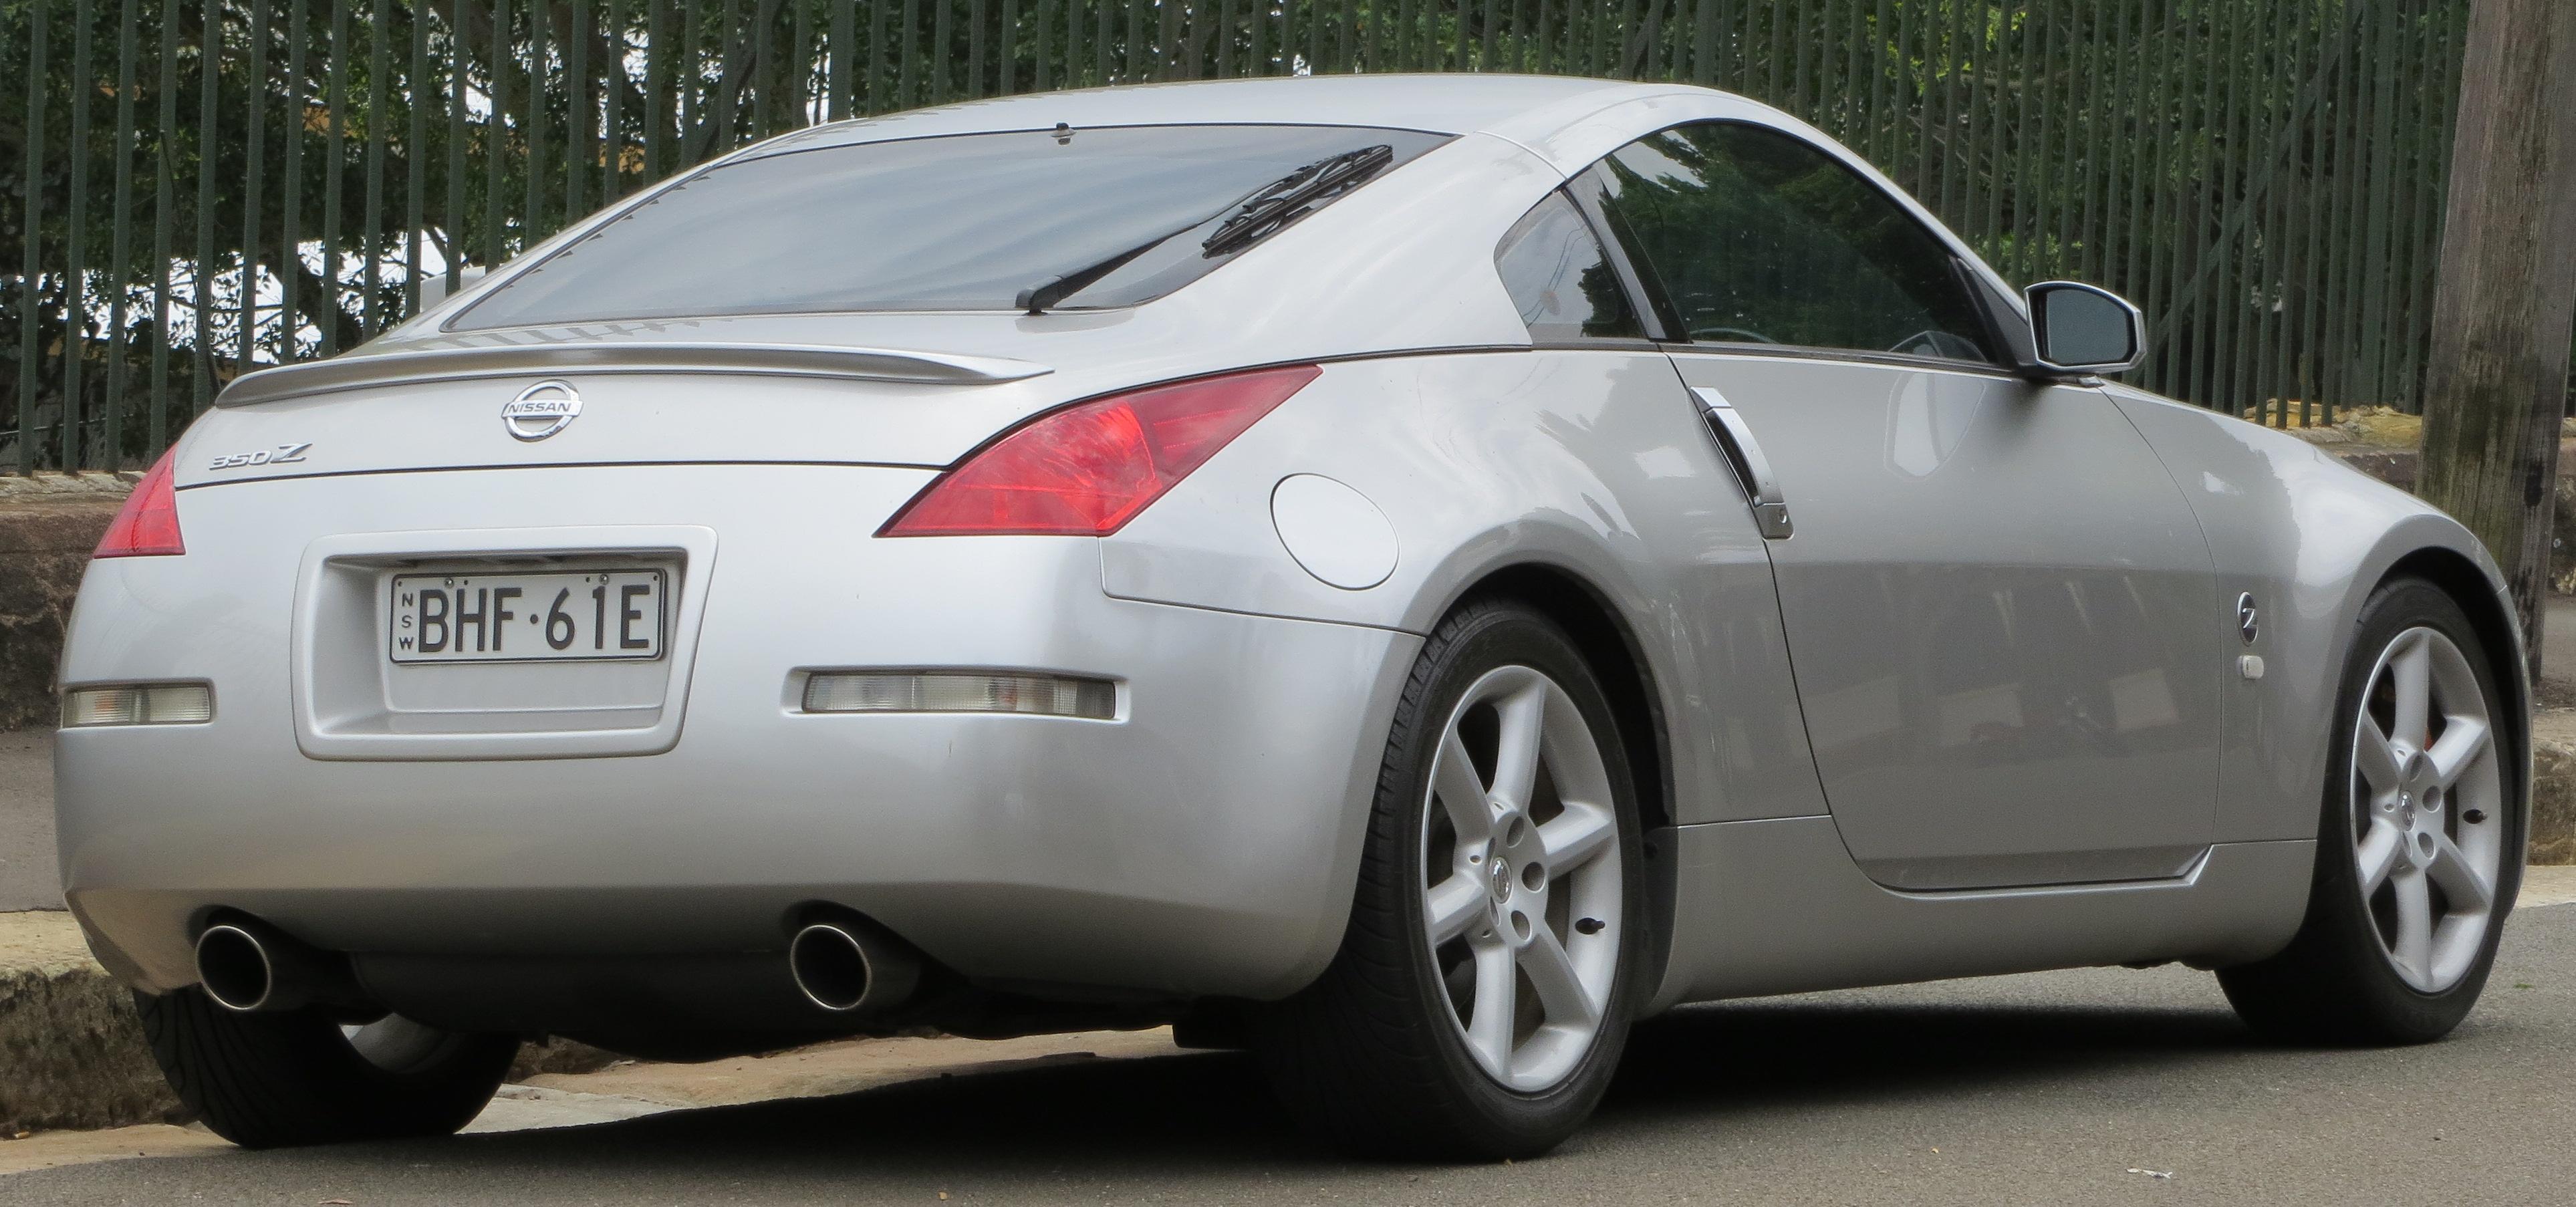 File:2003 Nissan 350Z (Z33) Track coupe (2012-10-26).jpg - Wikimedia